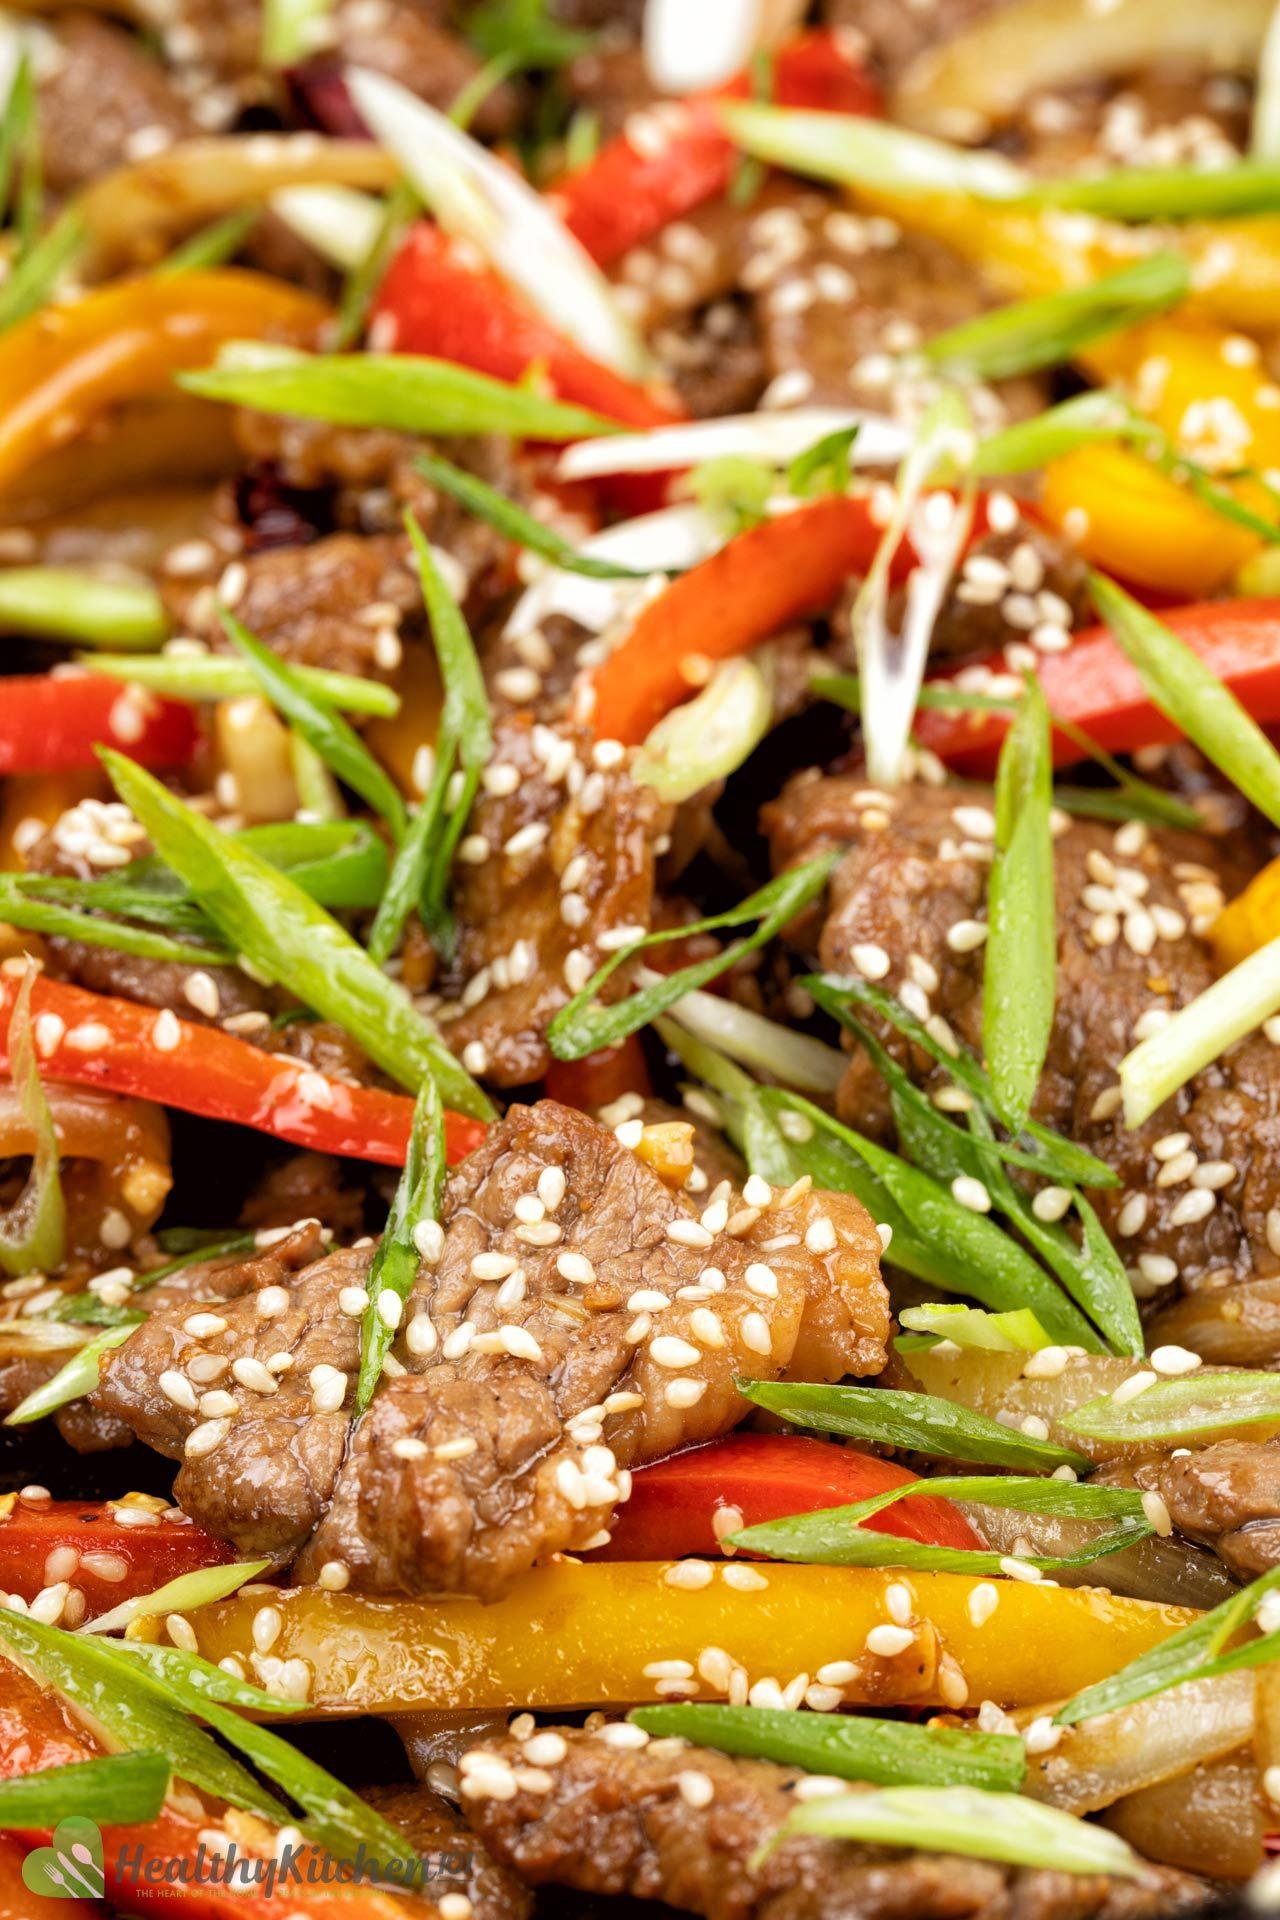 Homemade Pepper Steak Recipe Healthy Kitchen 101